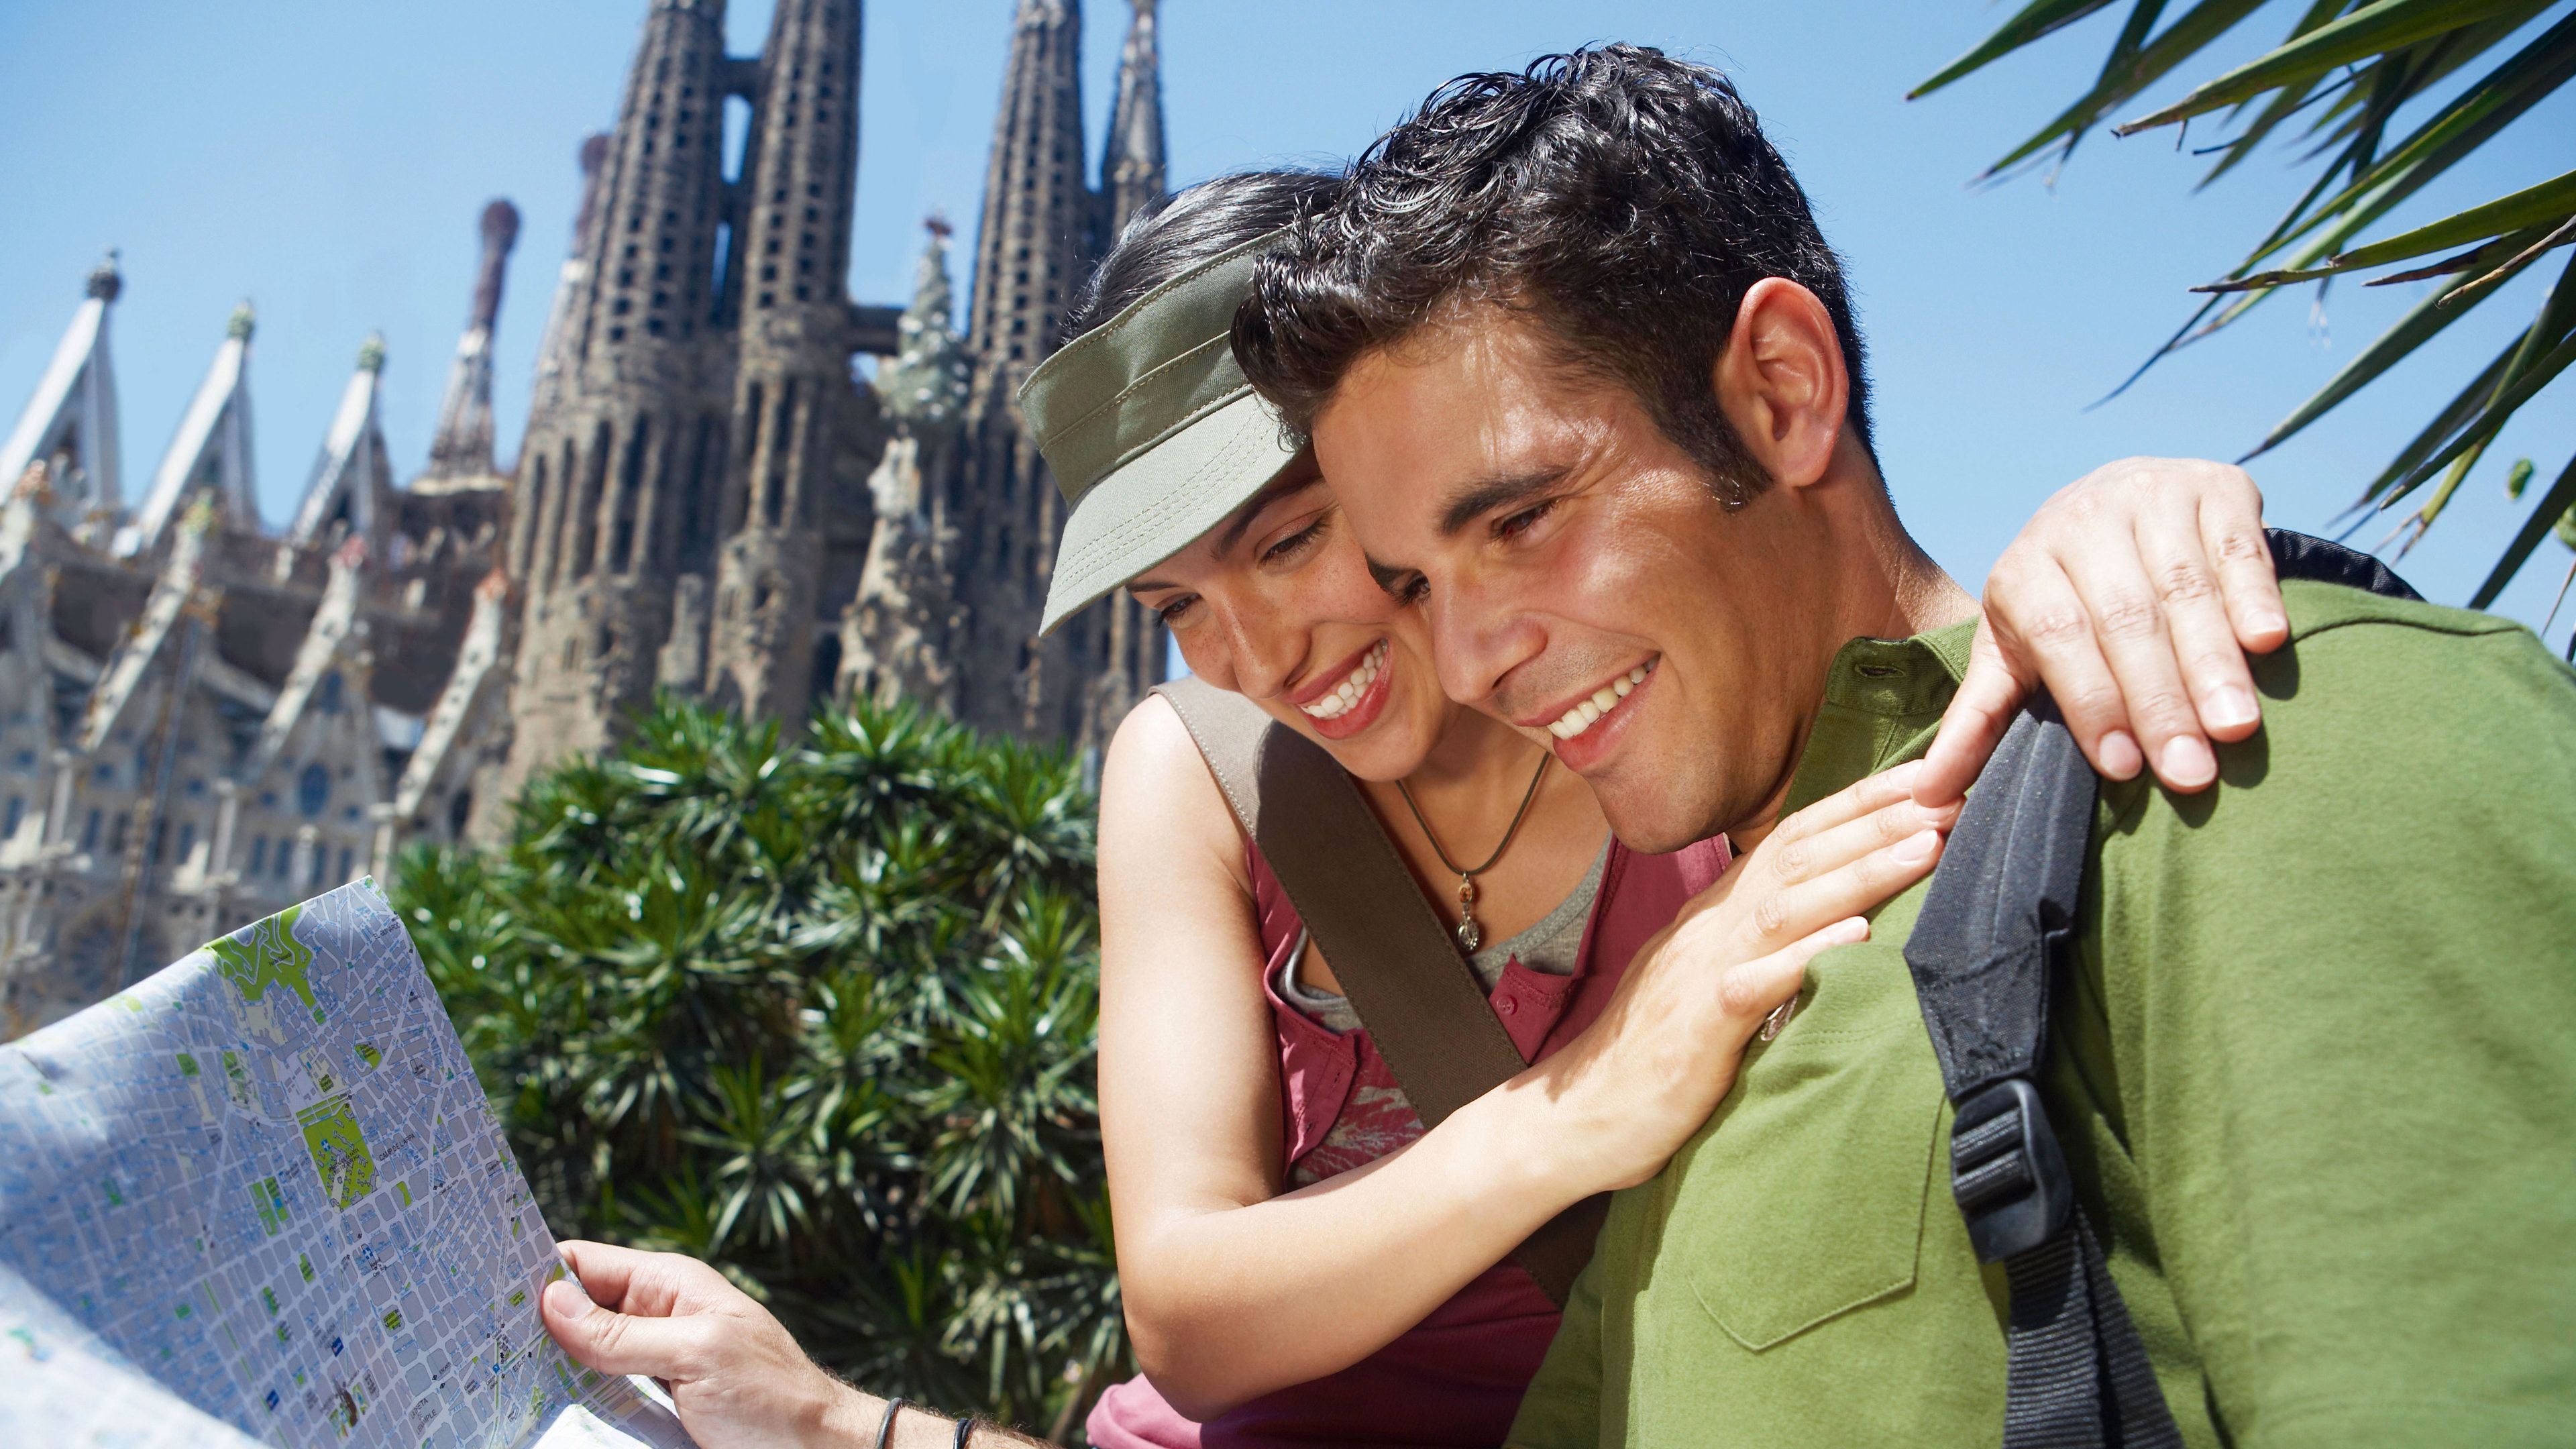 Skip-the-Line: Barcelona Highlights Small-Group Tour